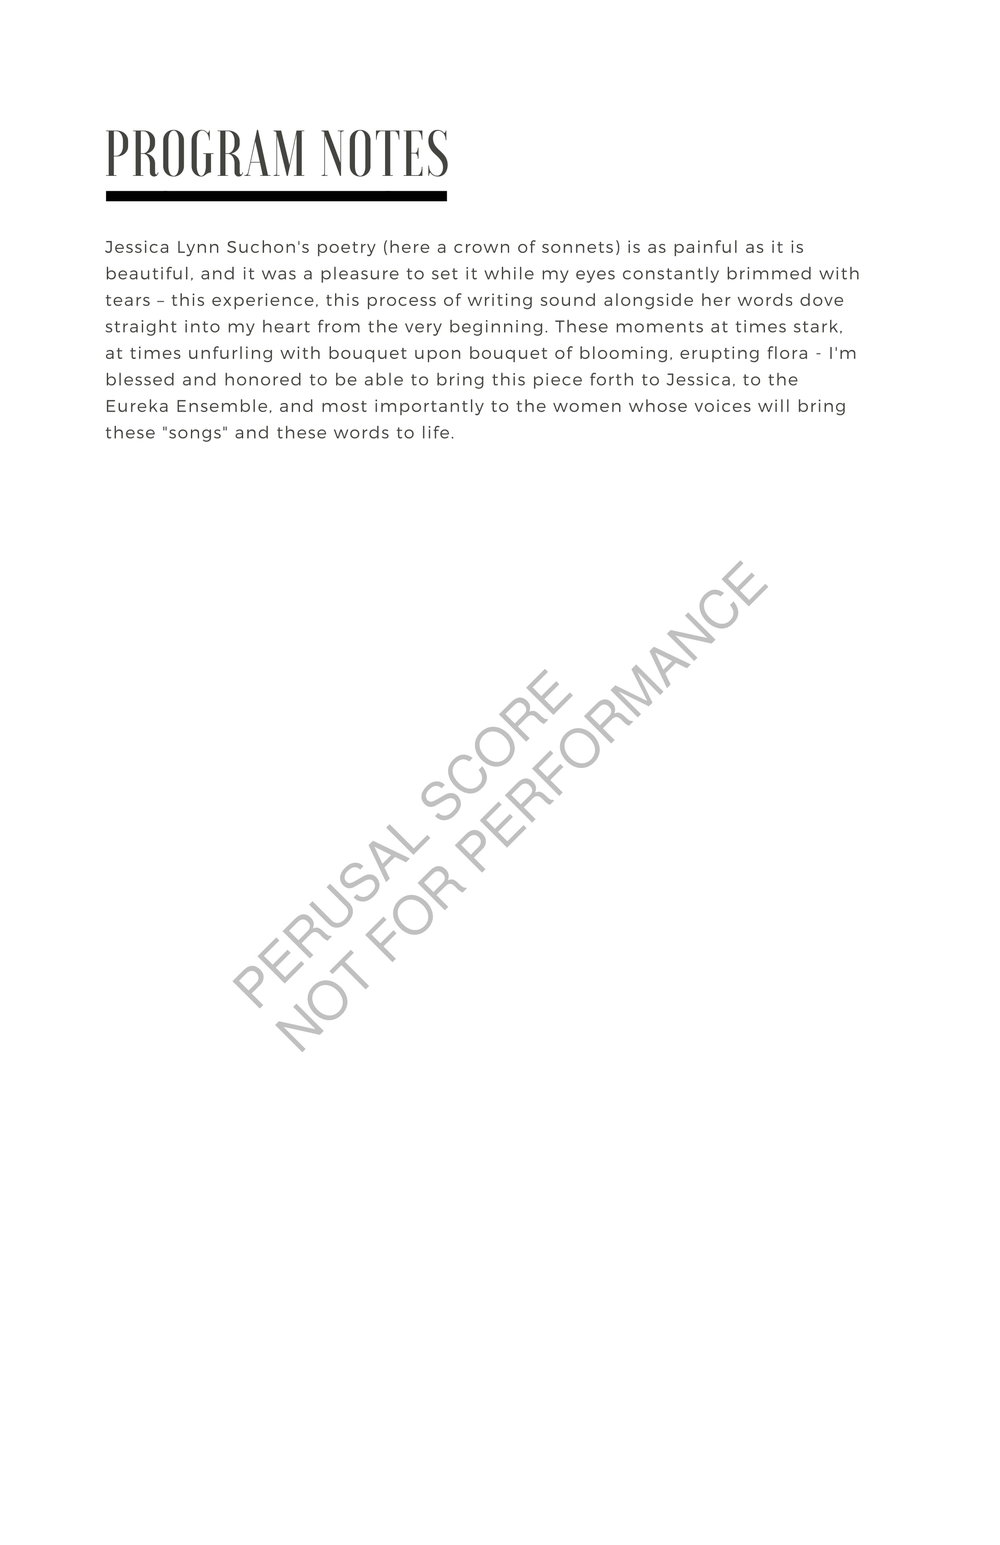 Boyd Sheltering Voices Score-watermark-04.jpg